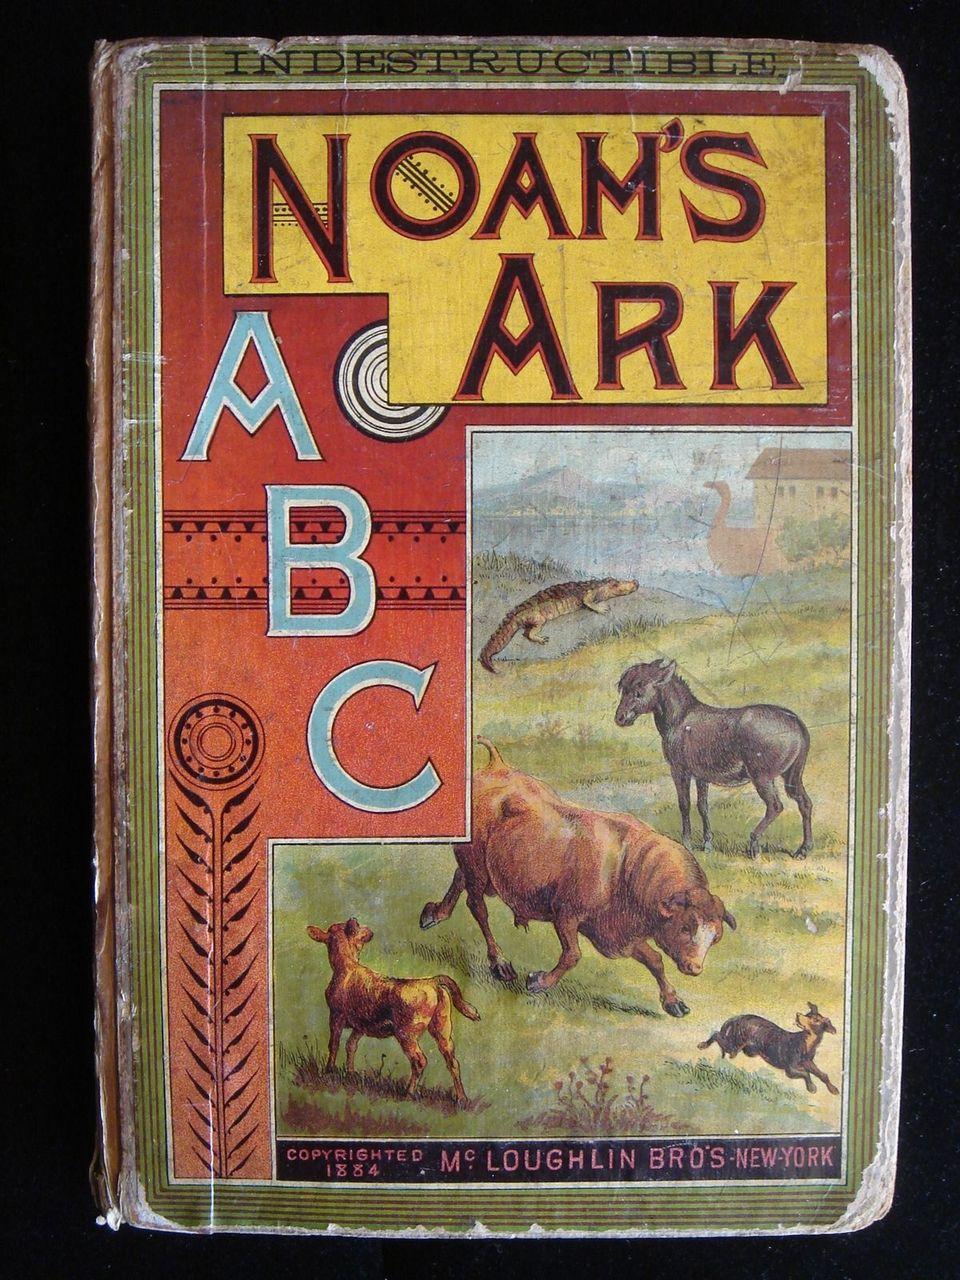 Indestructible Noah's Ark ABC McLoughlin Bros Children Illustrated Picture 1884